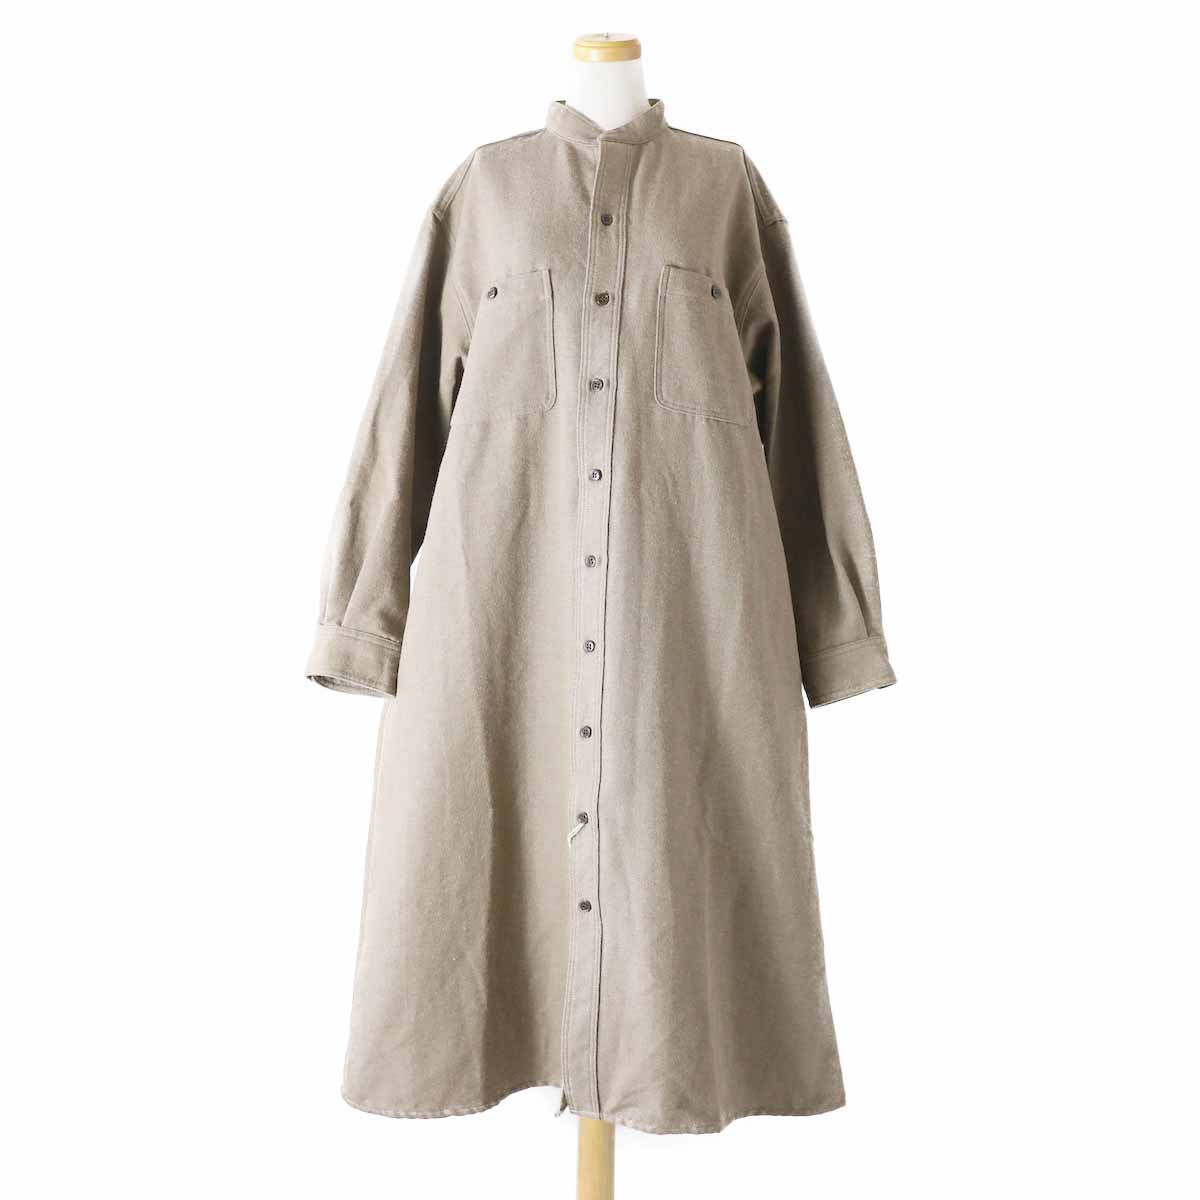 orSlow / Ladies Stand Collar Long Sleeve Shirt -KHAKI